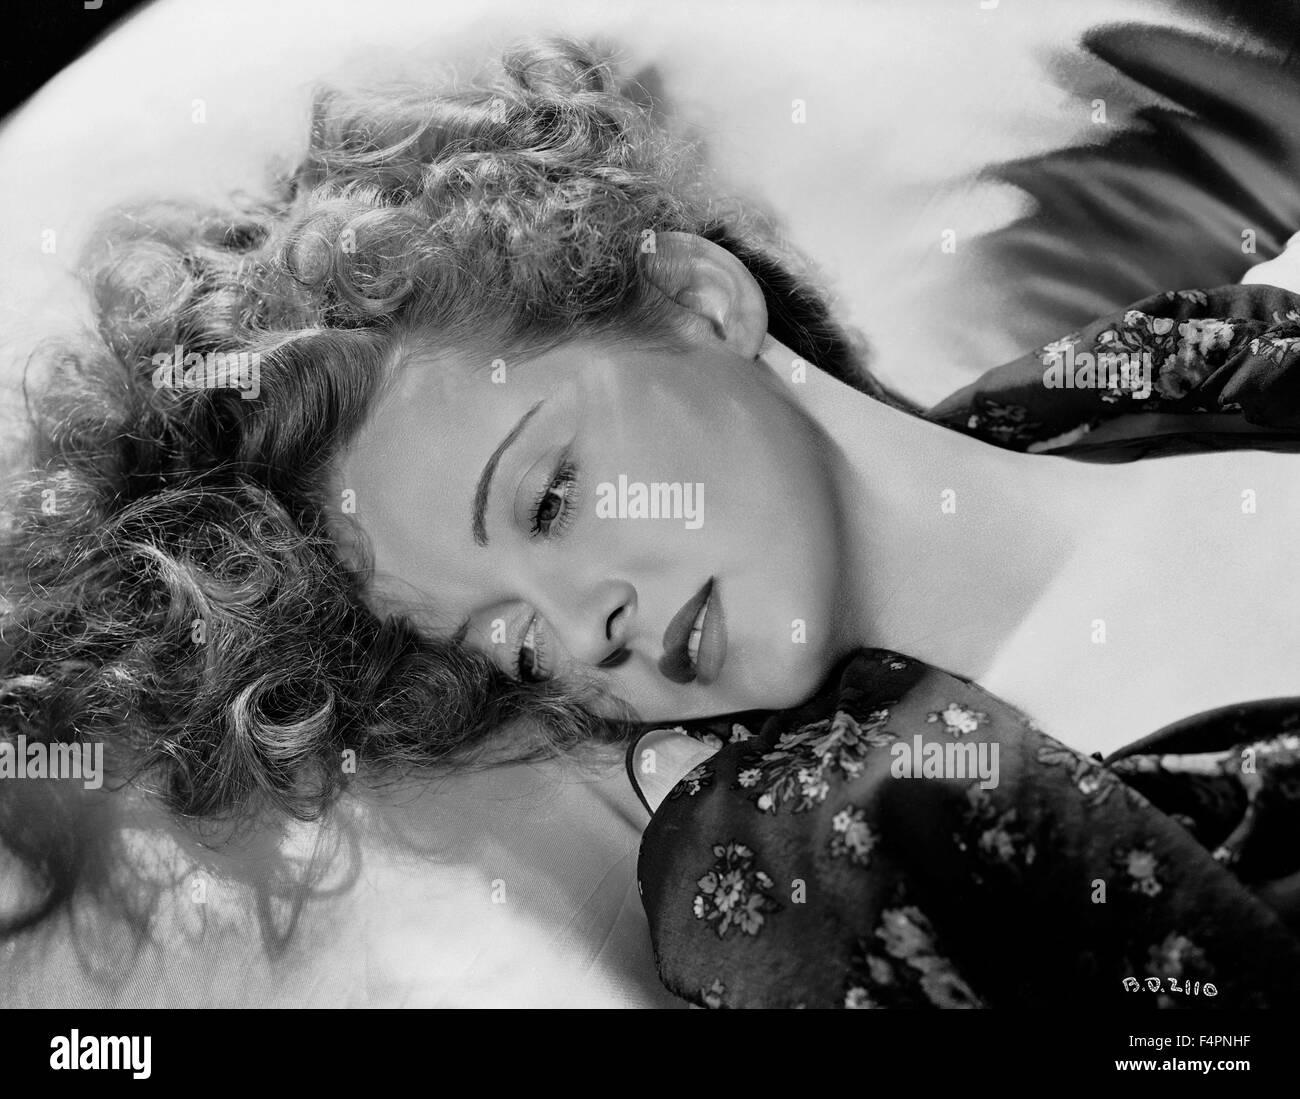 Bette Davis en los 30's Imagen De Stock